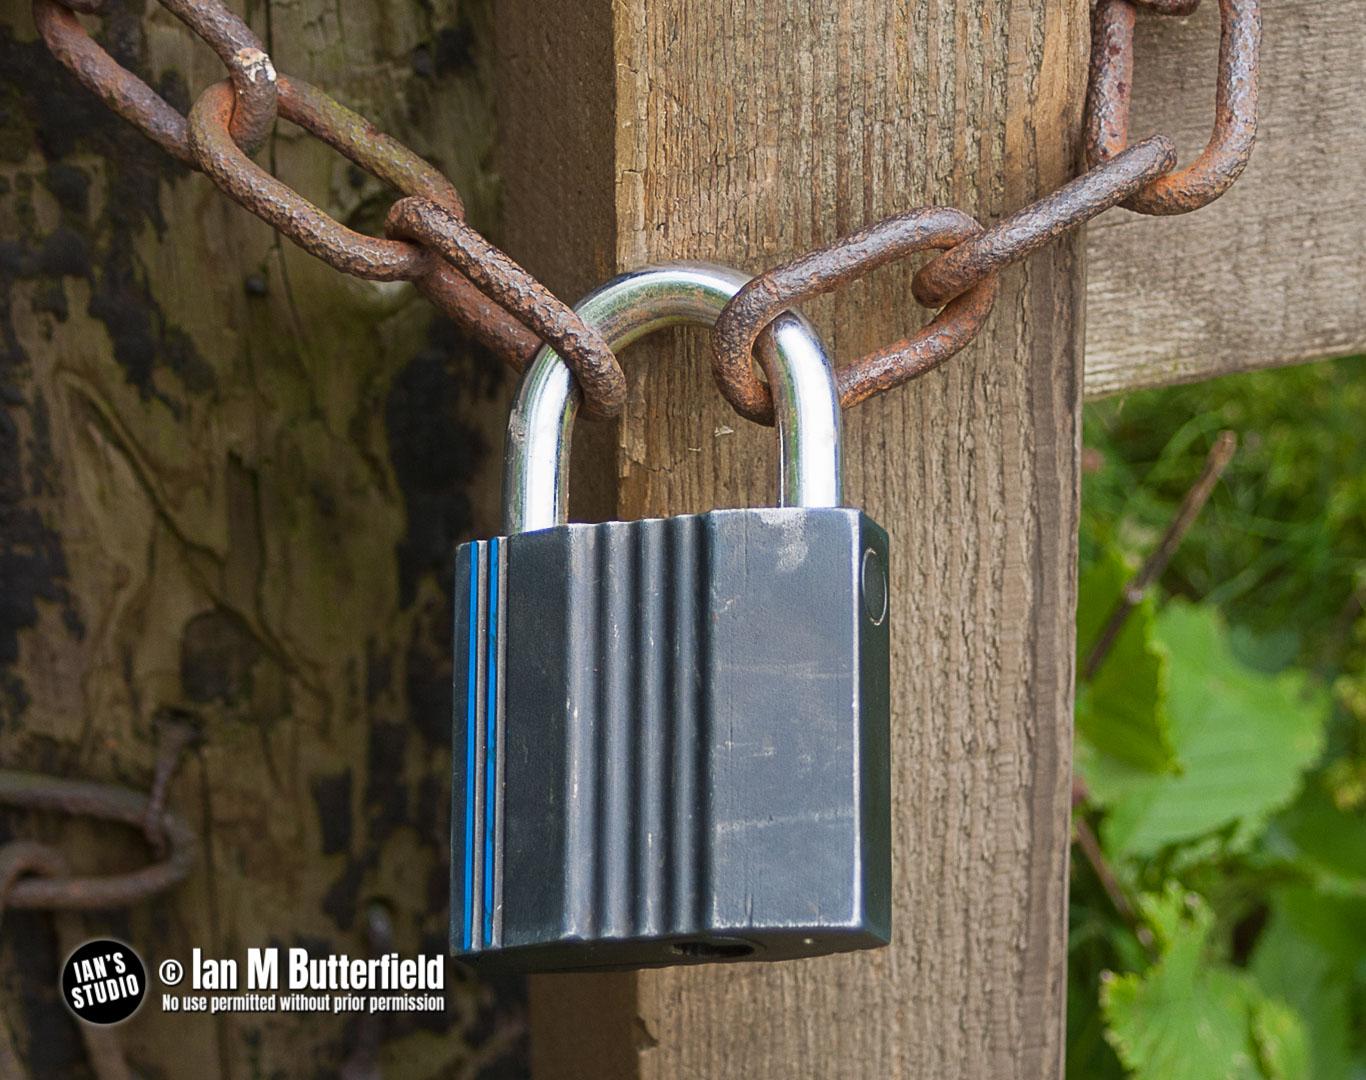 BLOG 2 NOV 2020 – Lockdown20 Challenge